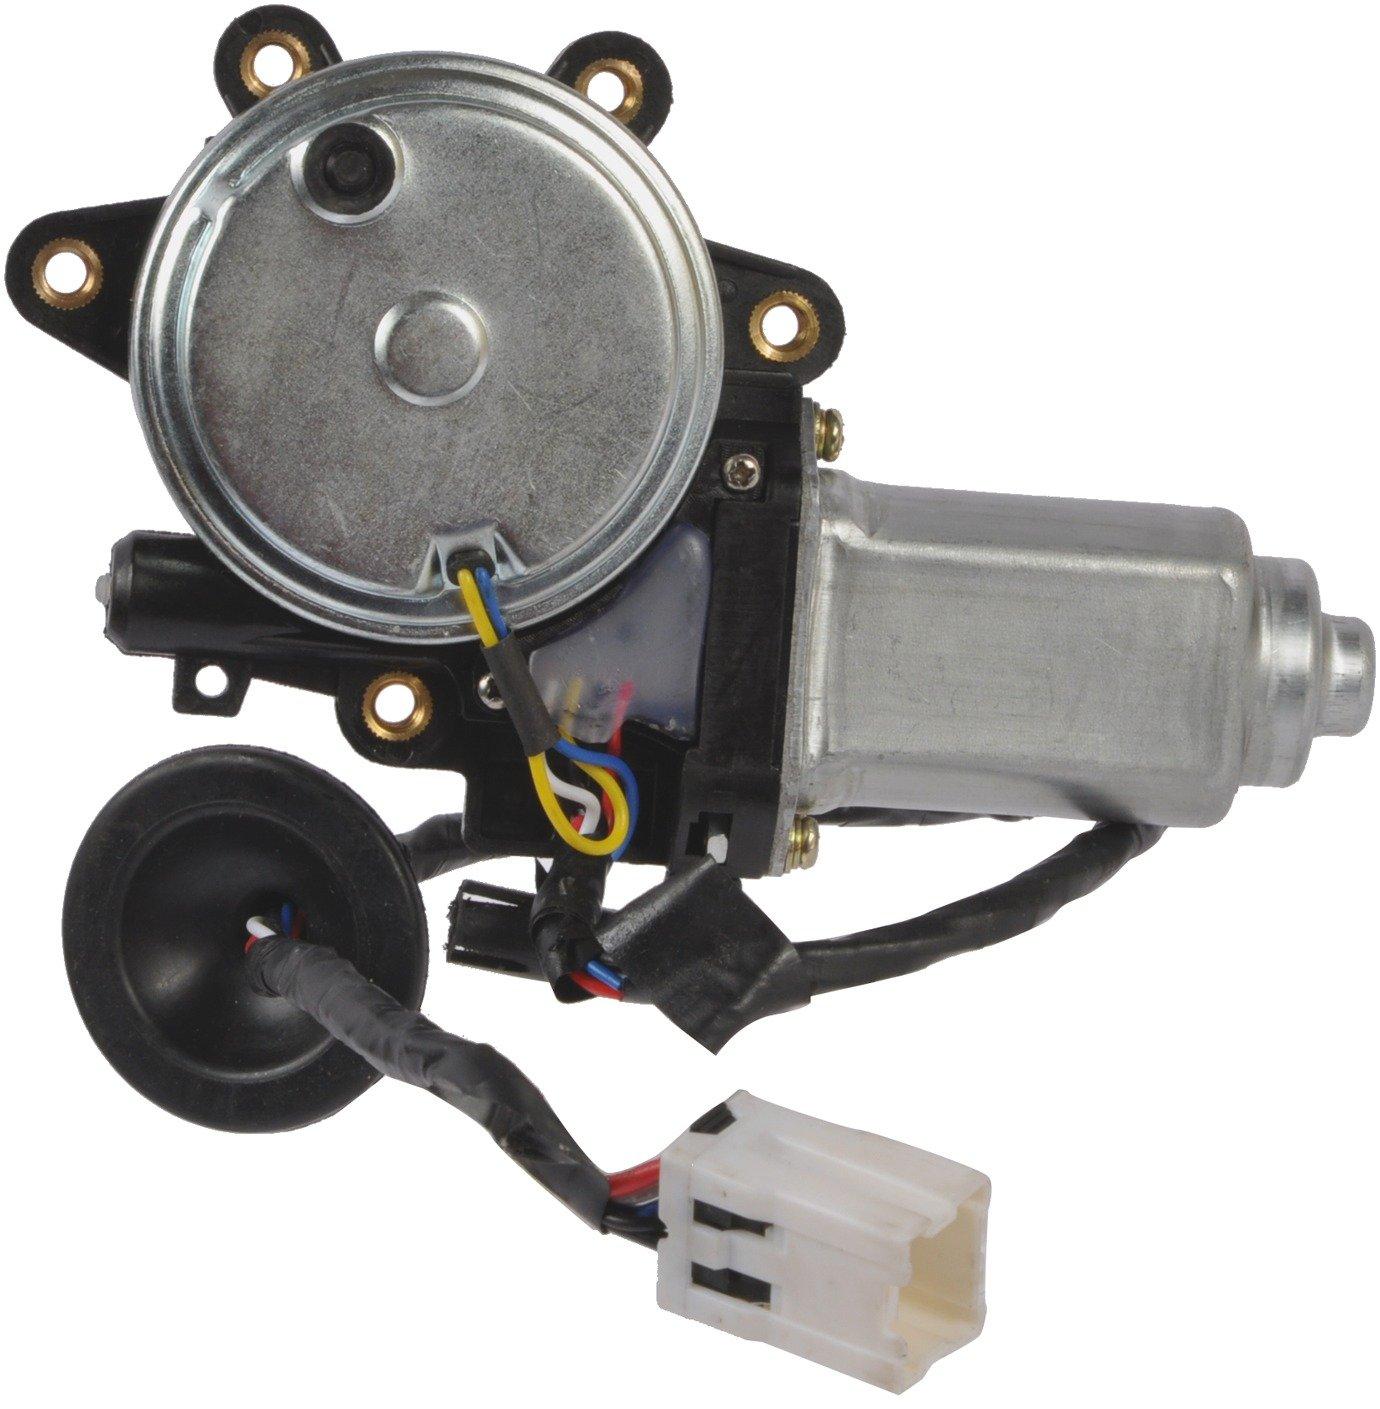 Cardone Select 82-1379 New Window Lift Motor